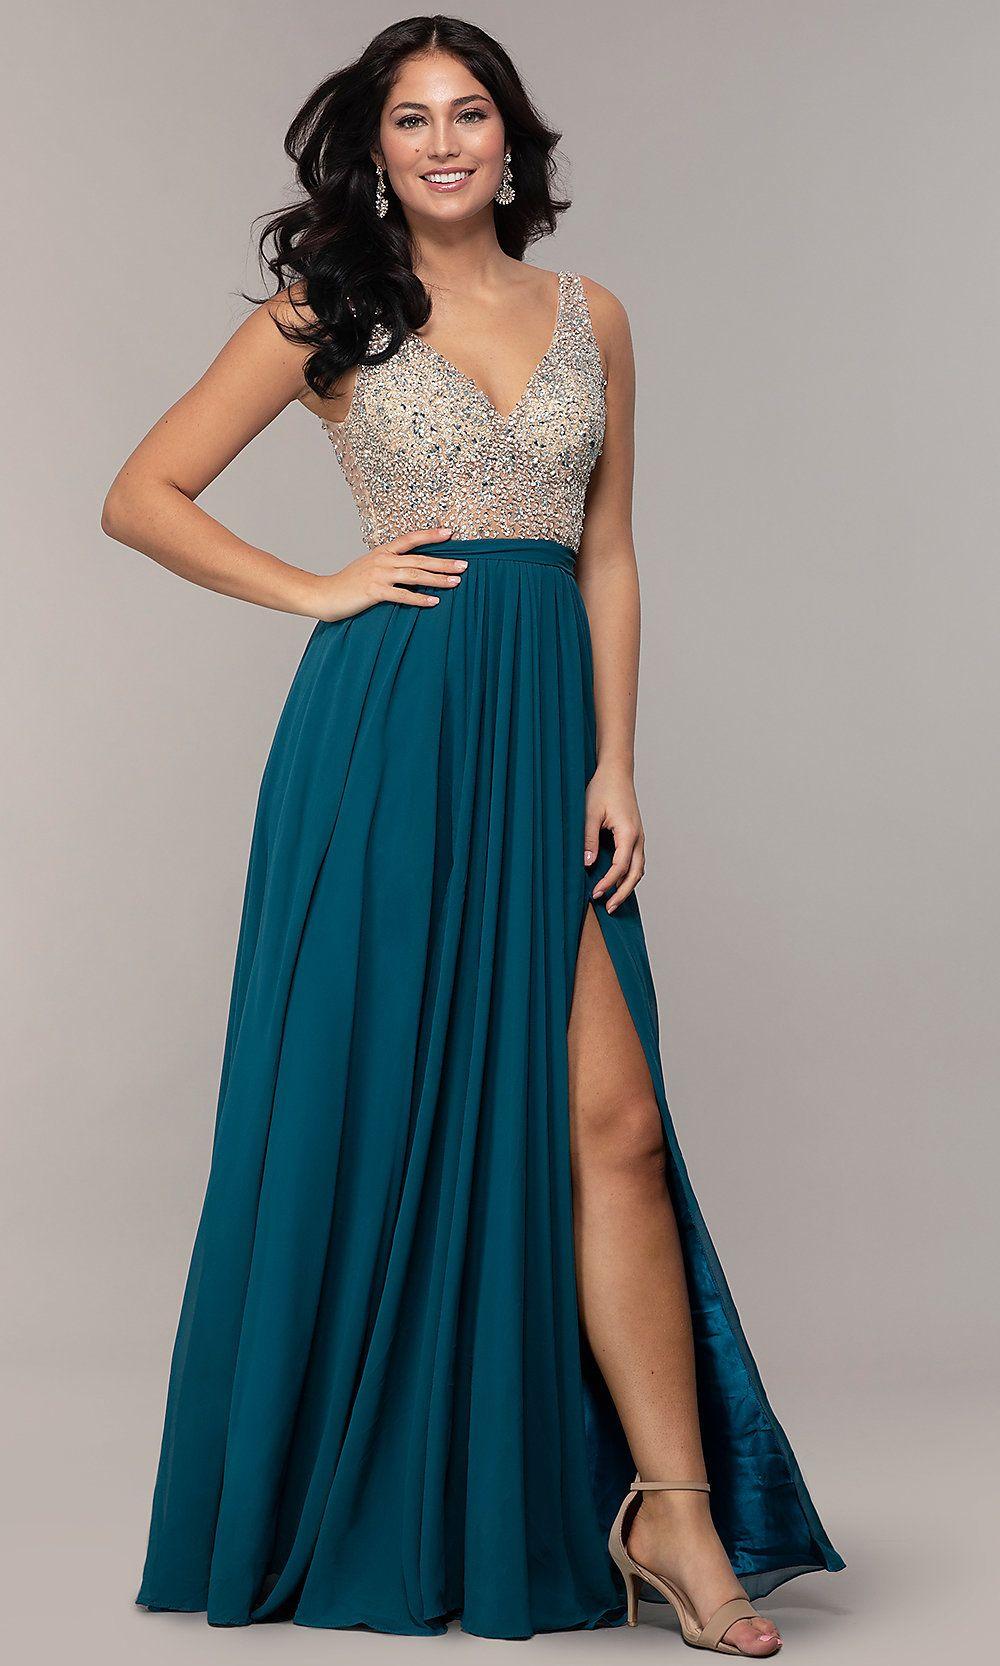 Embellished V-Neck Long Chiffon Prom Dress | Dresses, Long ...